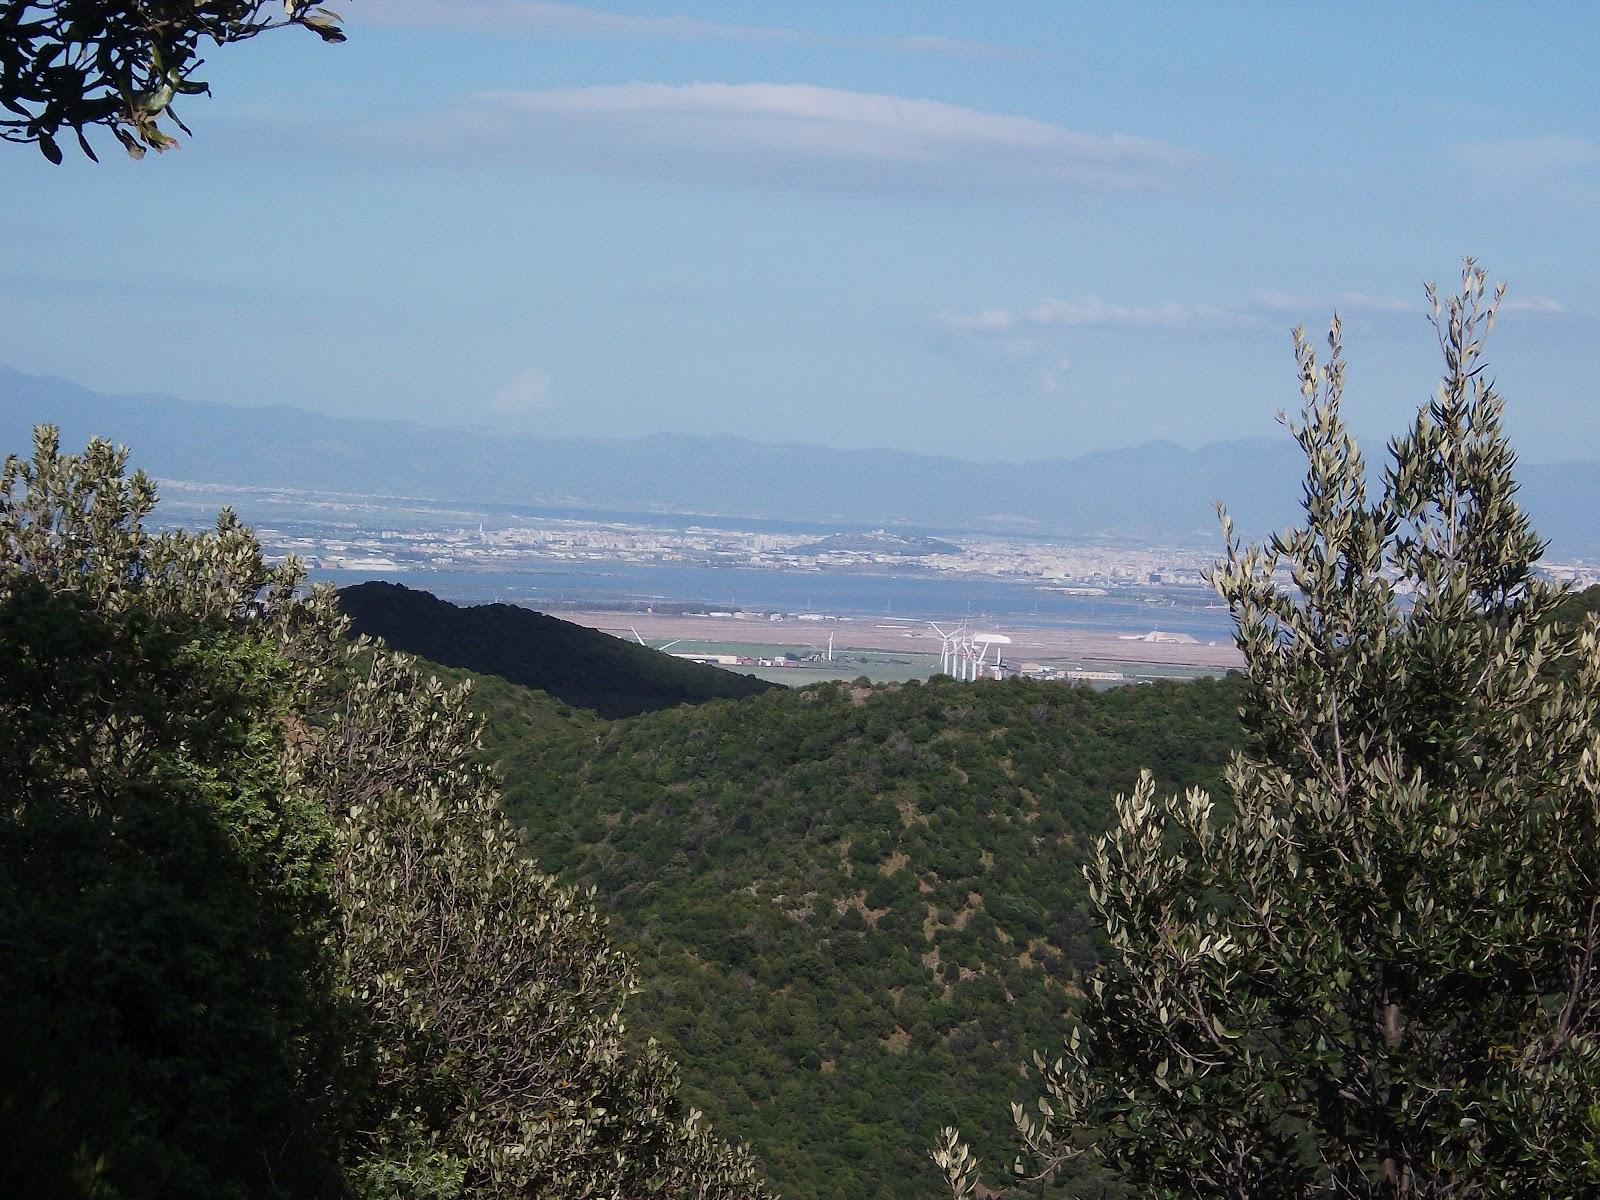 escursione-monte-arcosu-a5-scorcioaestdallecreste